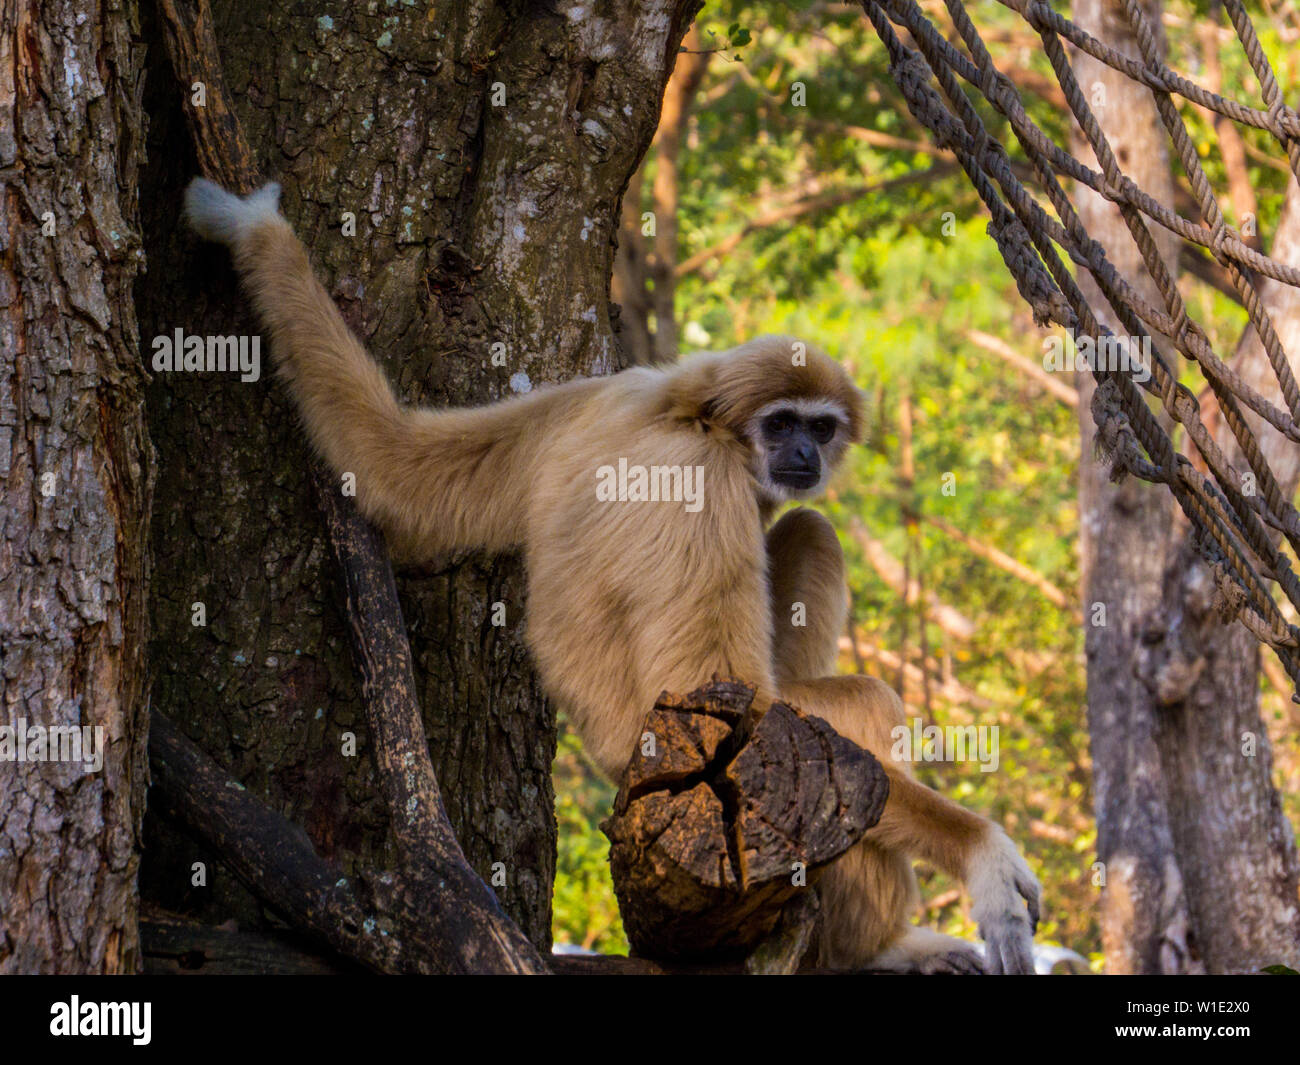 Gibbon en Khao Kheow zoológico abierto, en Sriracha, Chon Buri, Pattaya, Tailandia Foto de stock